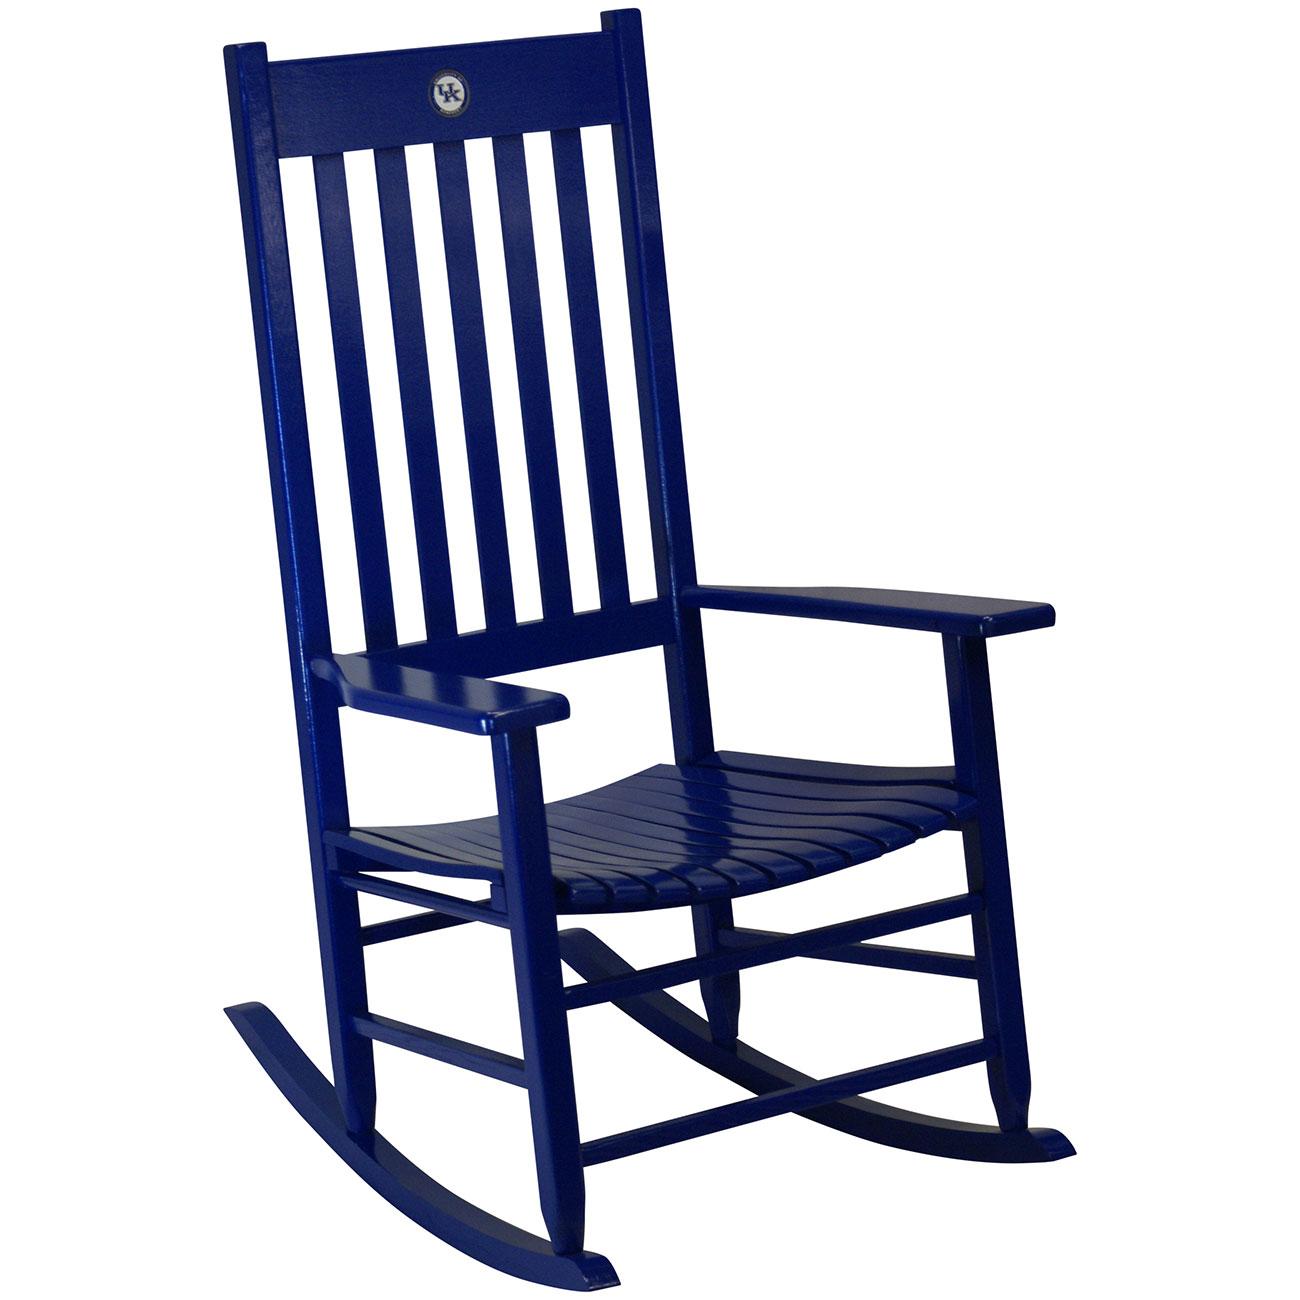 Team Color Rocking Chair - KentuckyTeam Color Rocking Chair - Kentucky ...  sc 1 st  Shop Cracker Barrel & shop.crackerbarrel.com: Team Color Rocking Chair - Kentucky ...